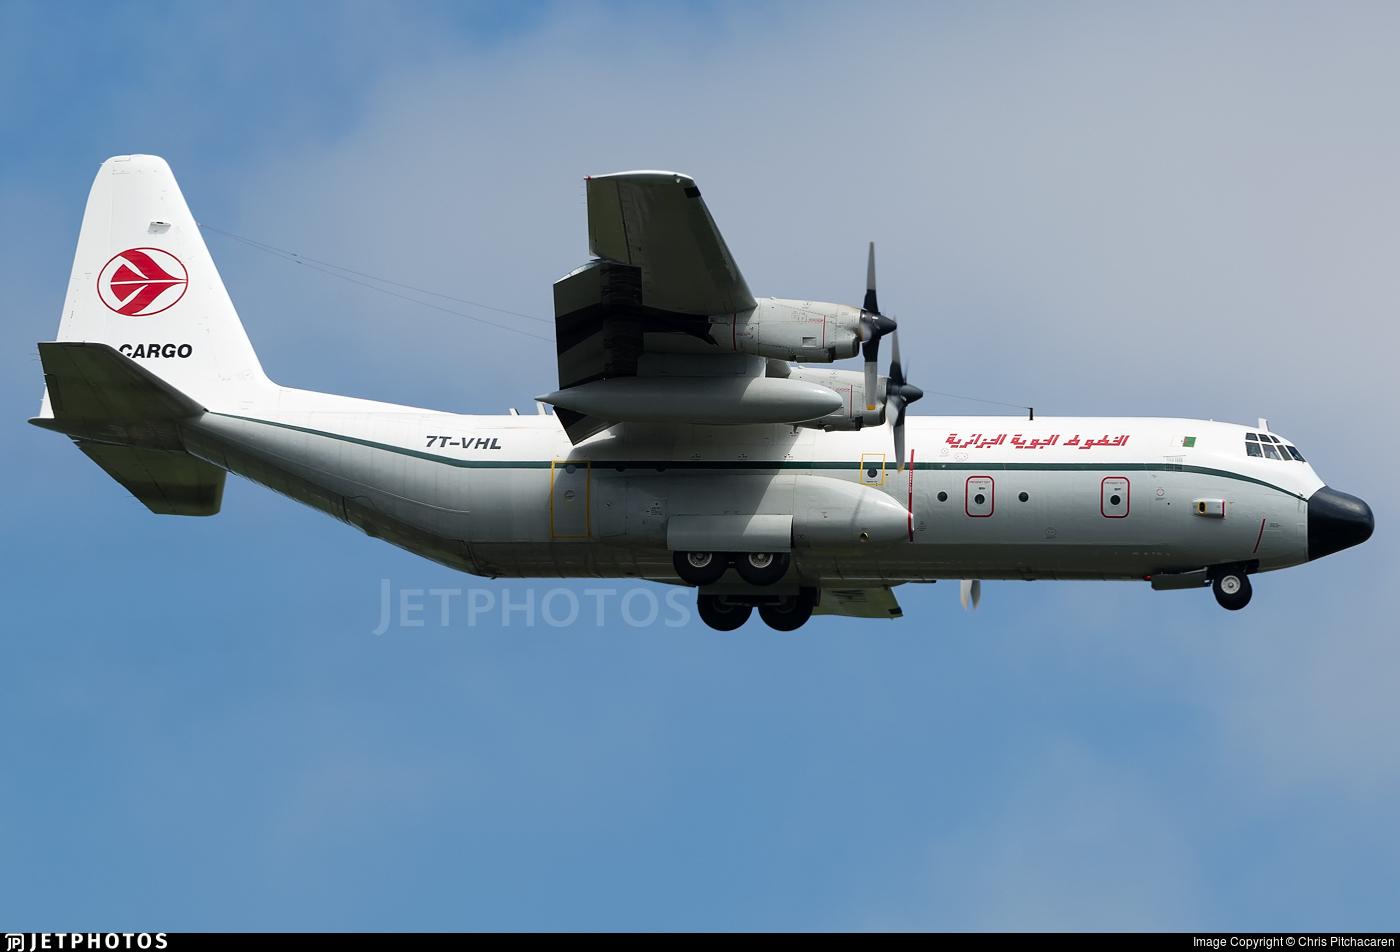 7T-VHL - Lockheed L-100-30 Hercules - Air Algérie